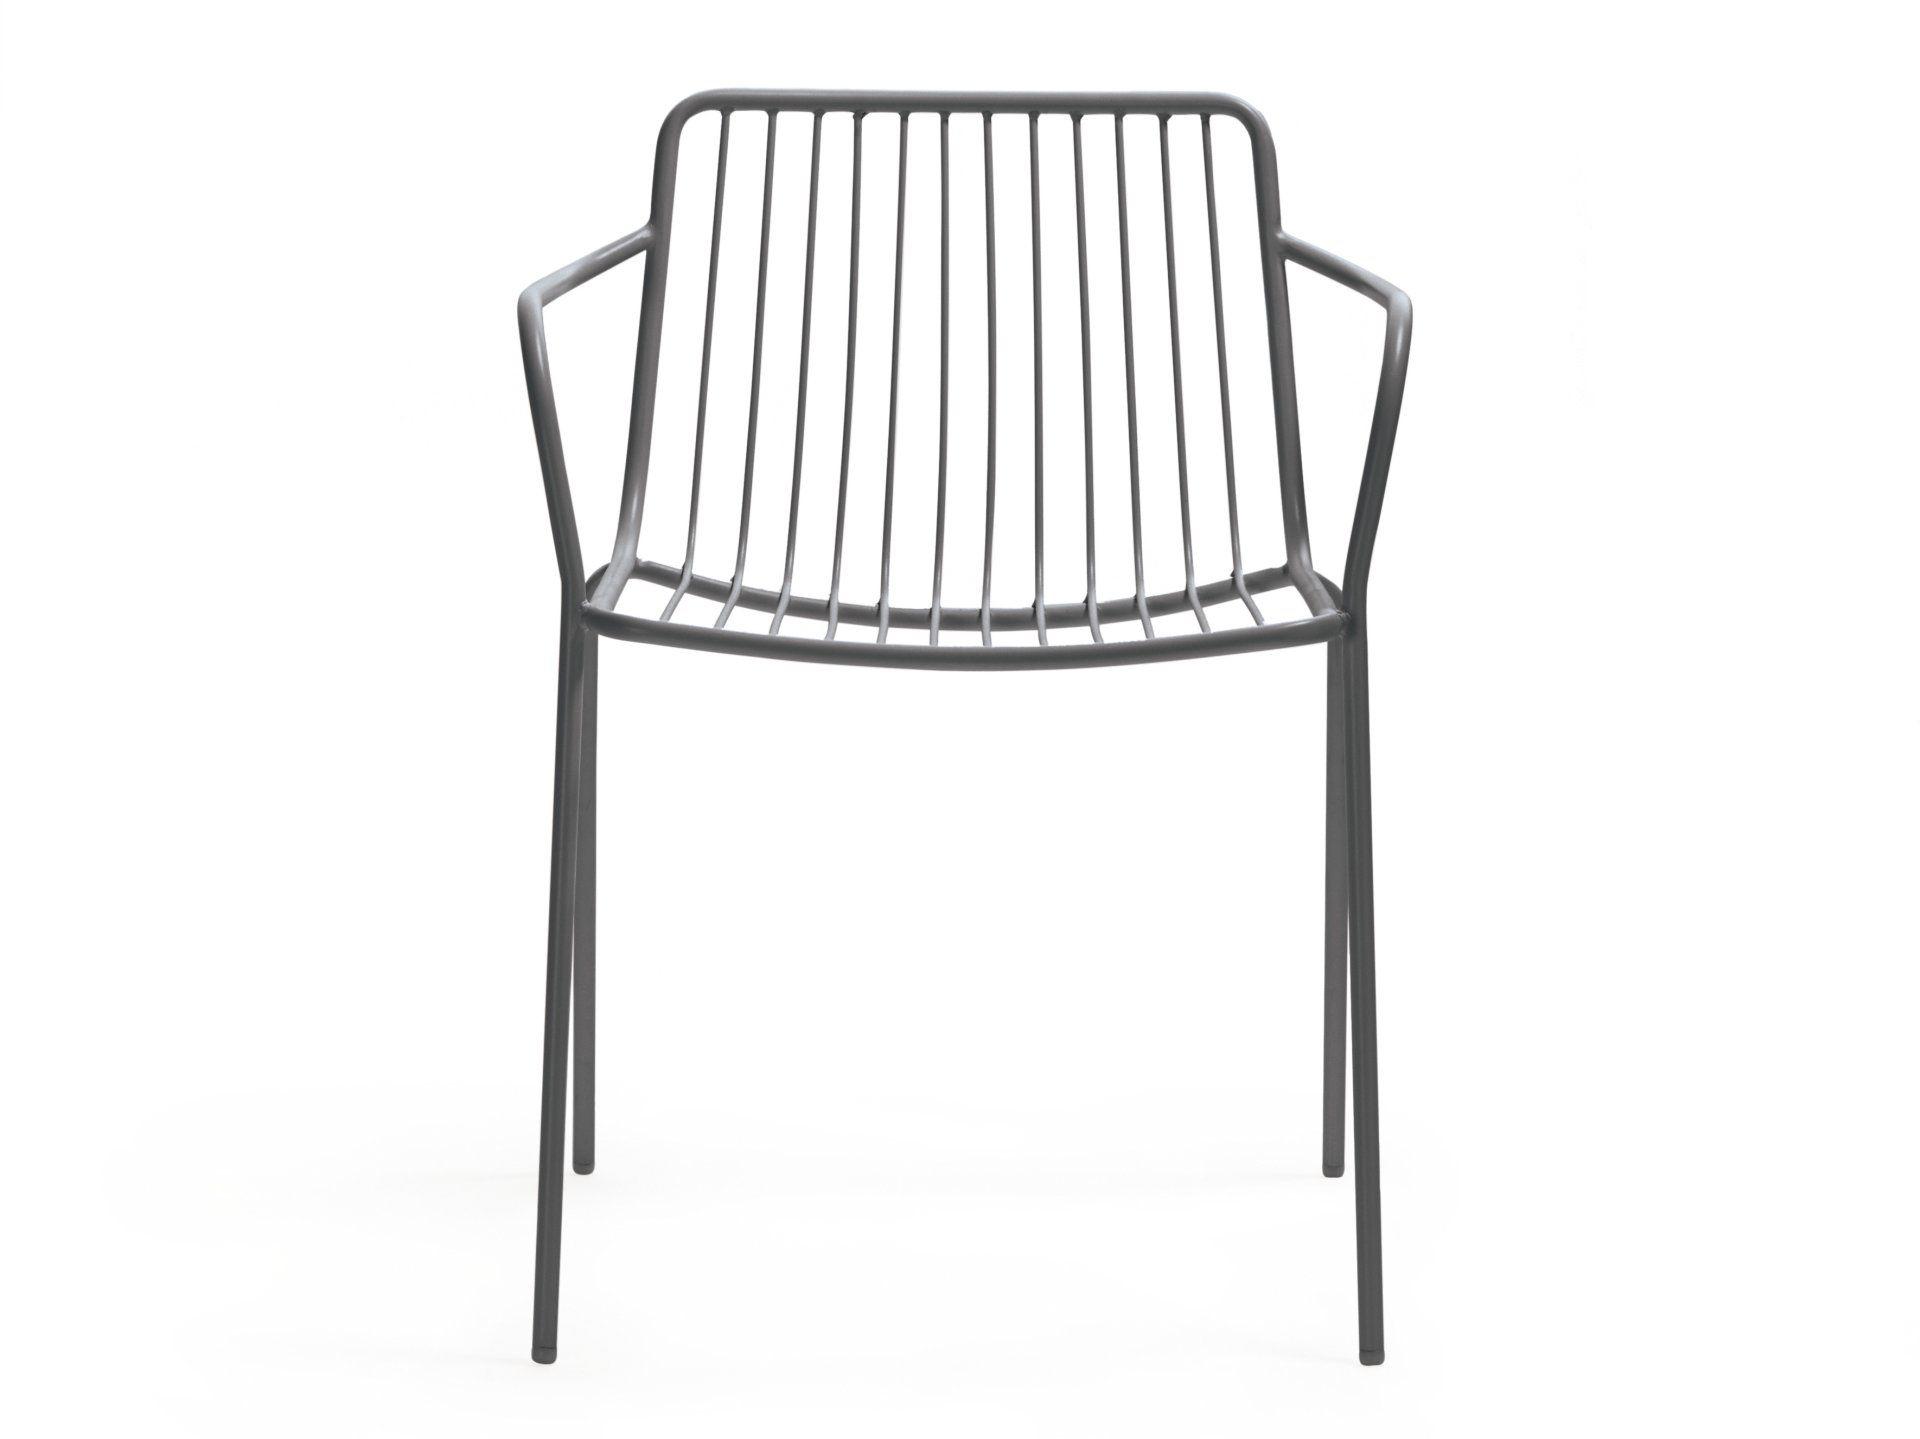 UPPER PANAMA  Silla NOLITA 3655  Sillas  Outdoor chairs